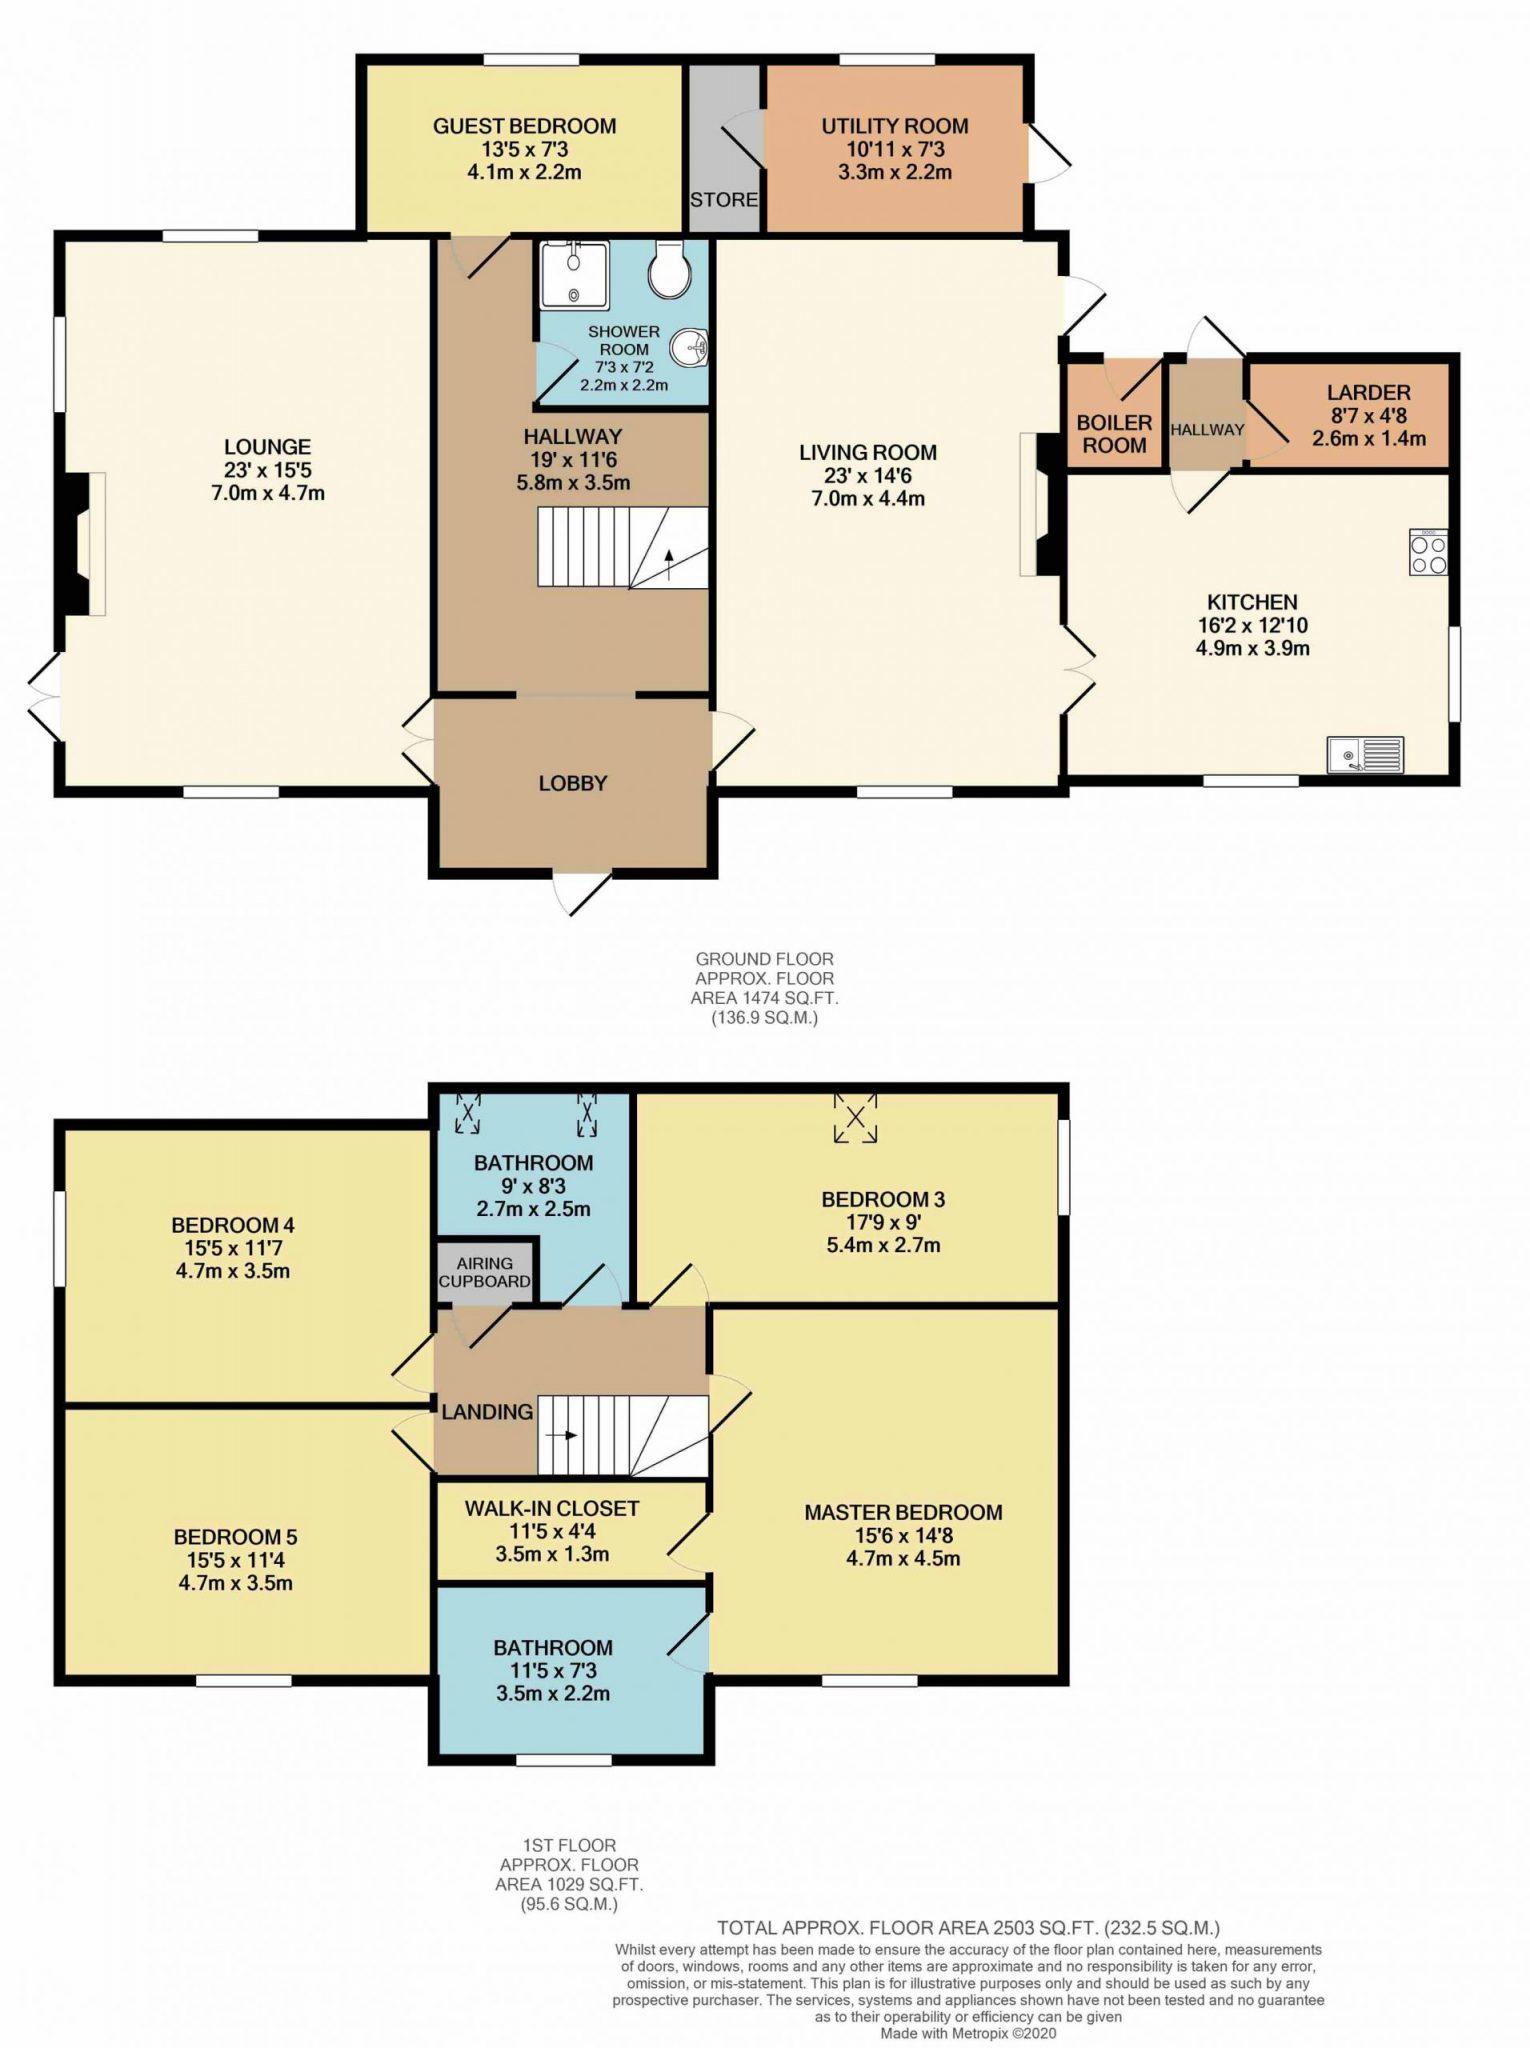 GortnacowleyBantry floor plan